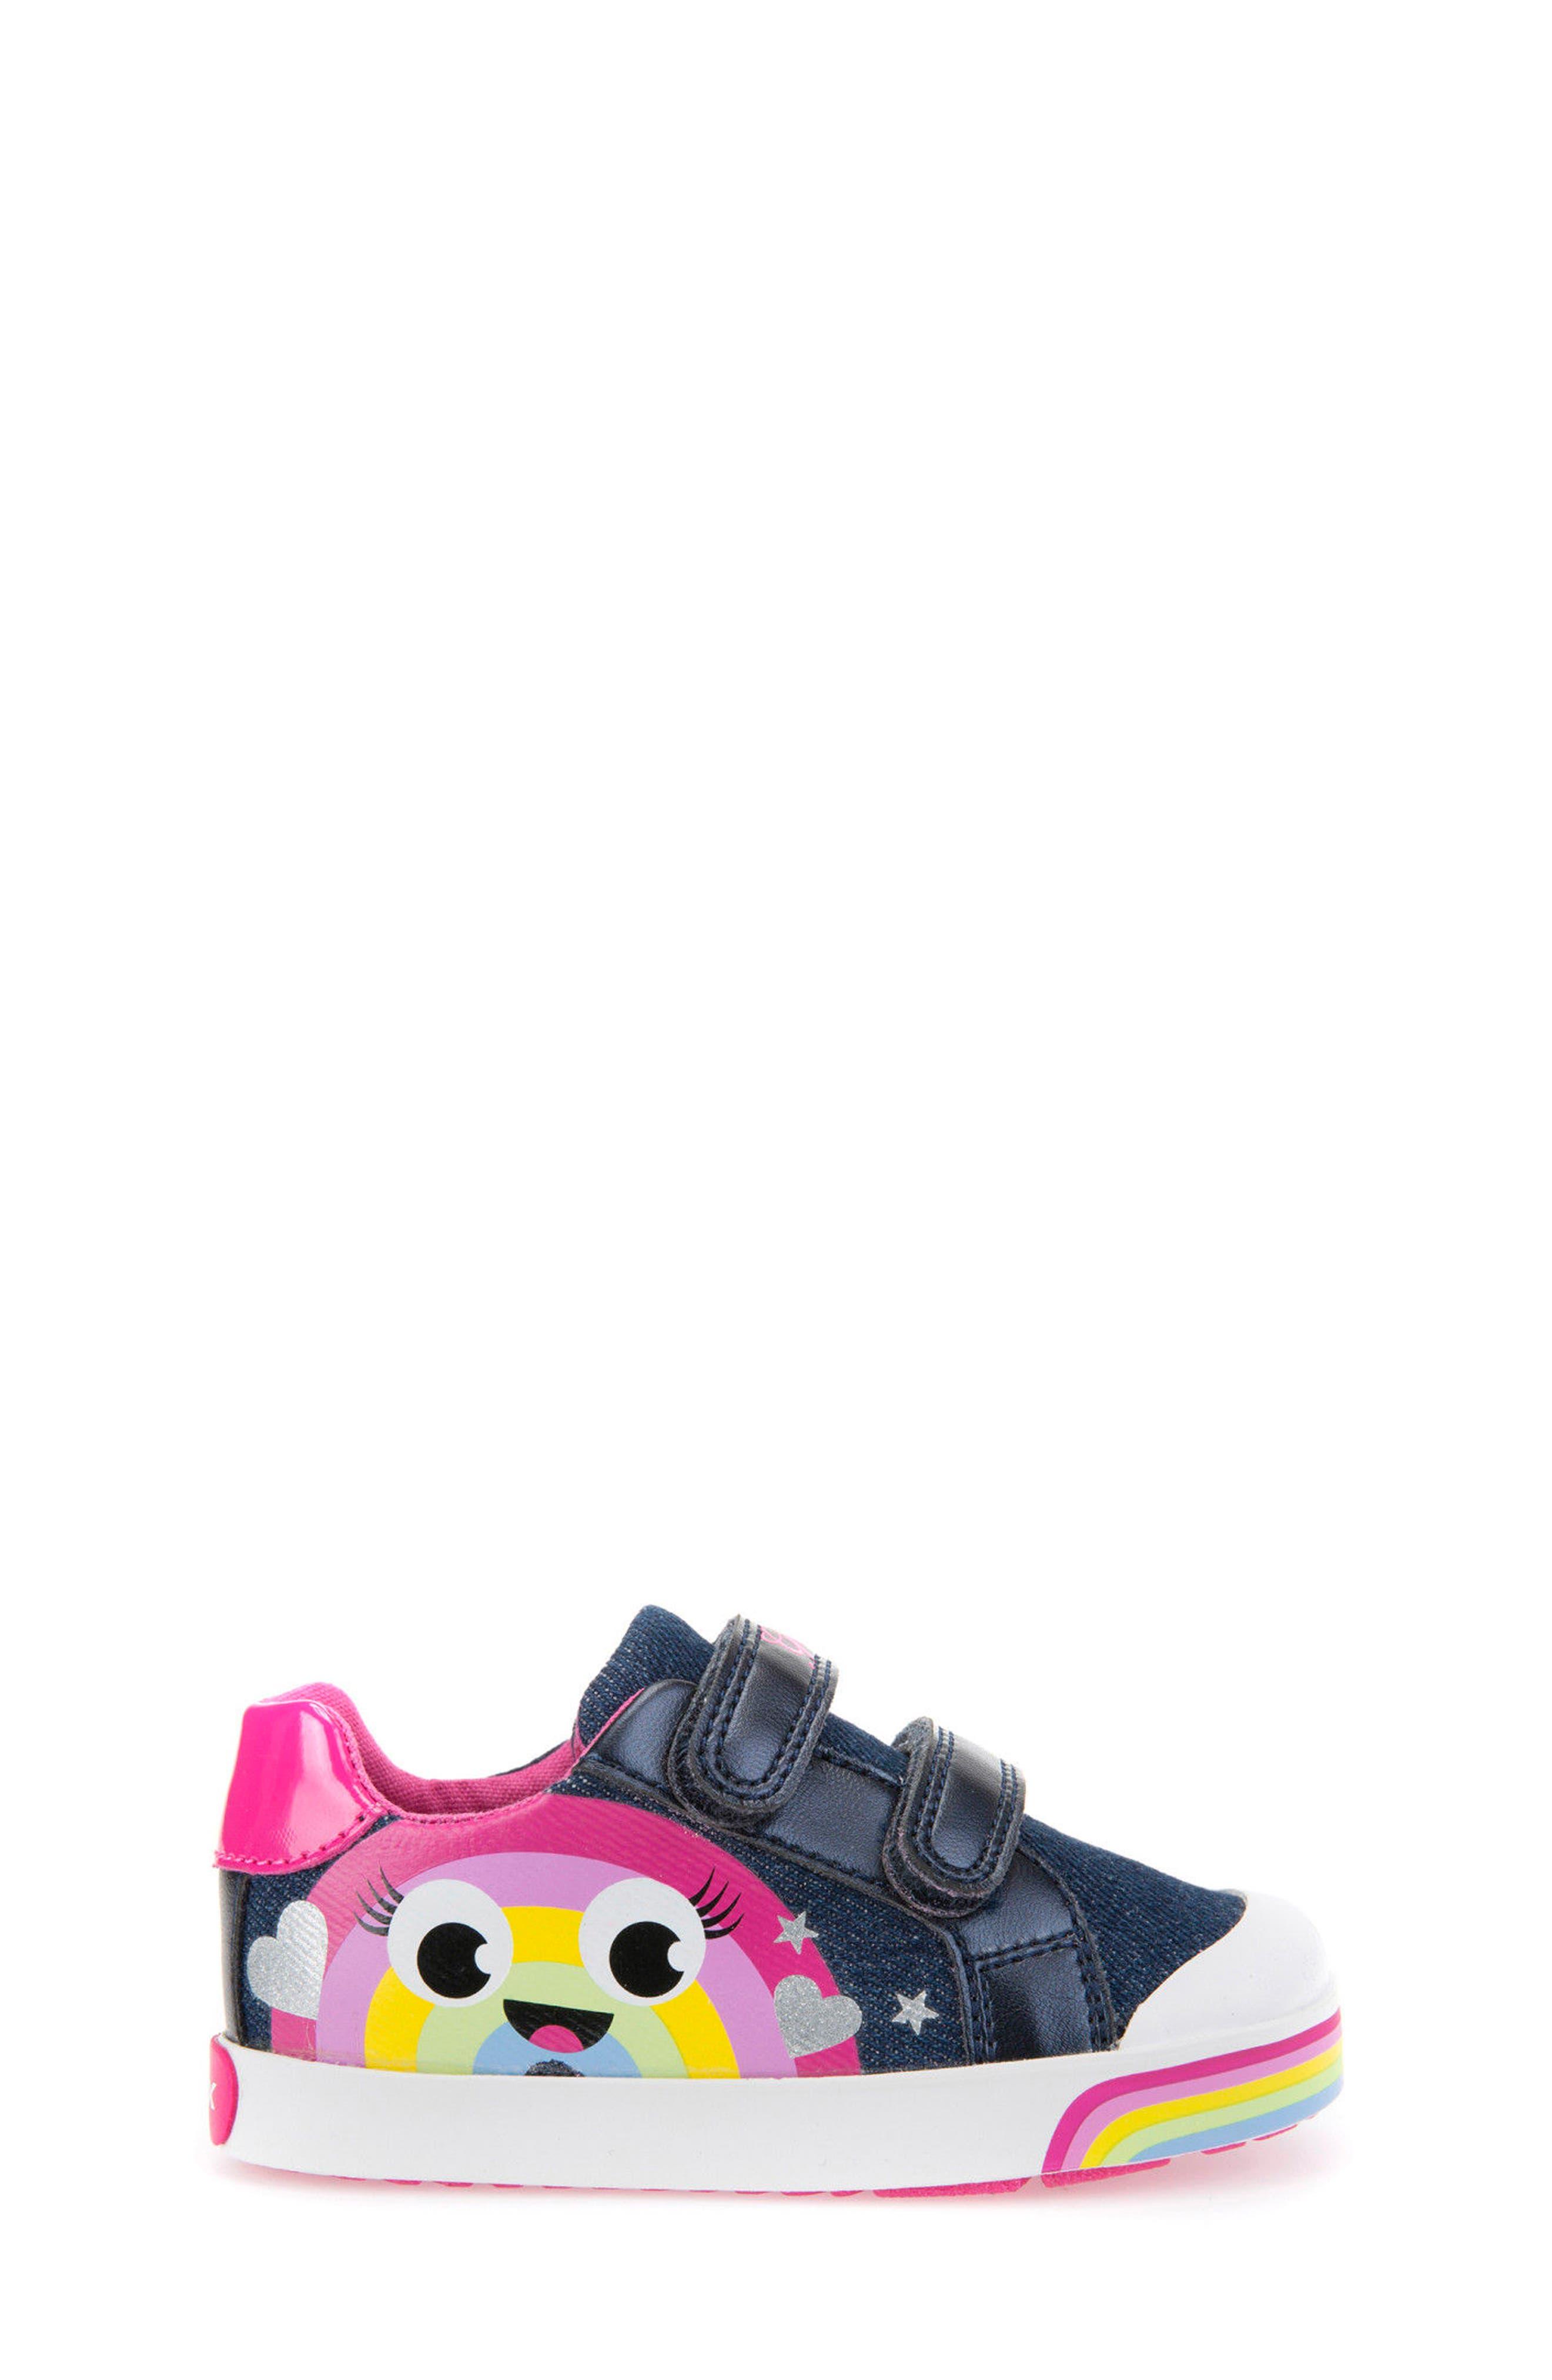 Kilwi Low Top Sneaker,                             Alternate thumbnail 3, color,                             Avio/ Multicolor